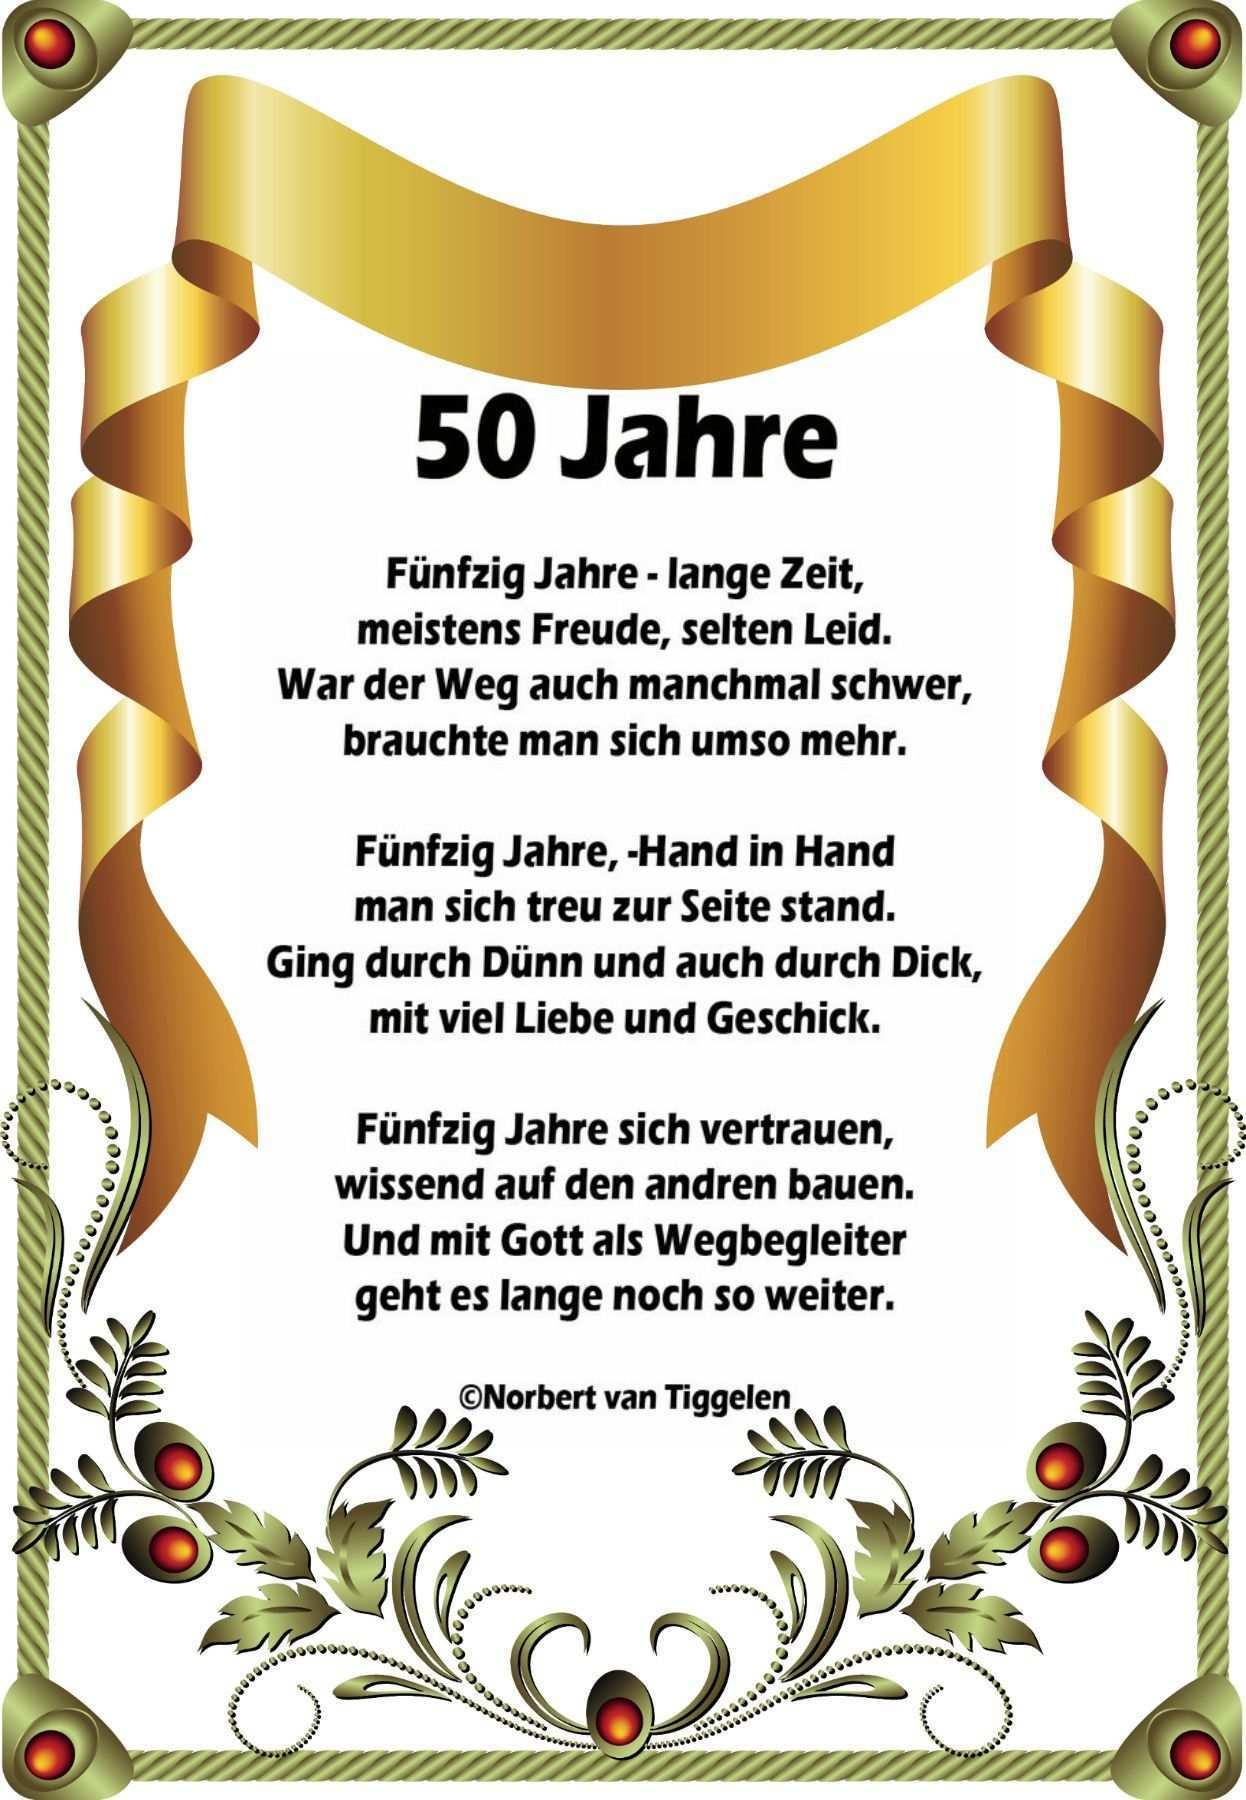 Goldene Hochzeit Geschenkideen Goldene Hochzeit Spruche Zur Goldenen Hochzeit Goldene Hochzeit